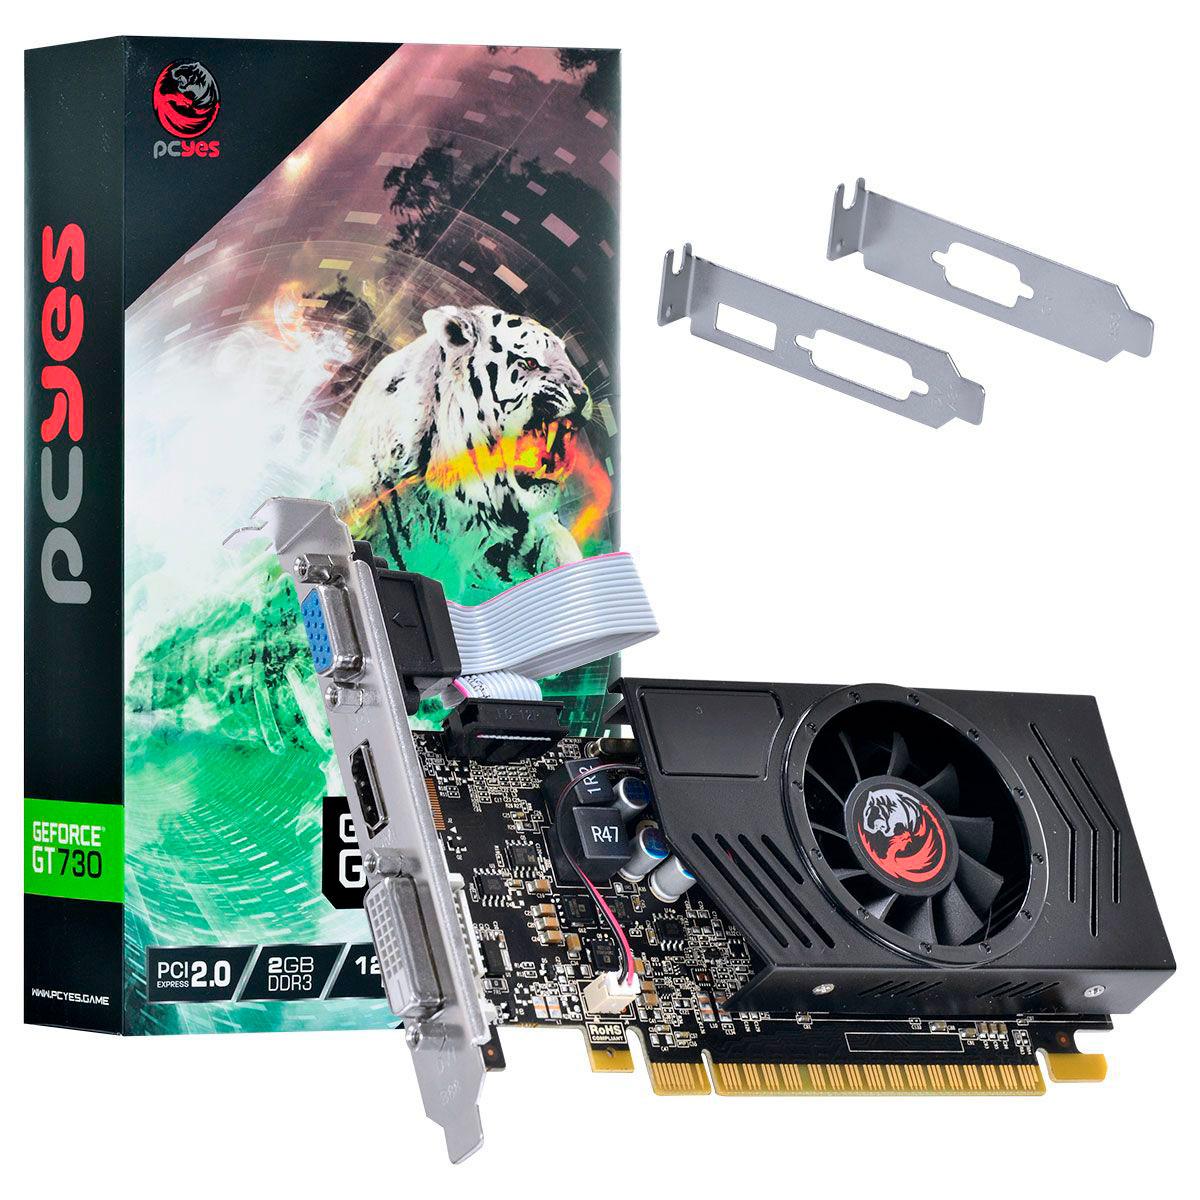 Placa de Vídeo Pcyes GT730 2GB DDR3 128 - PA730GT12802D3LP